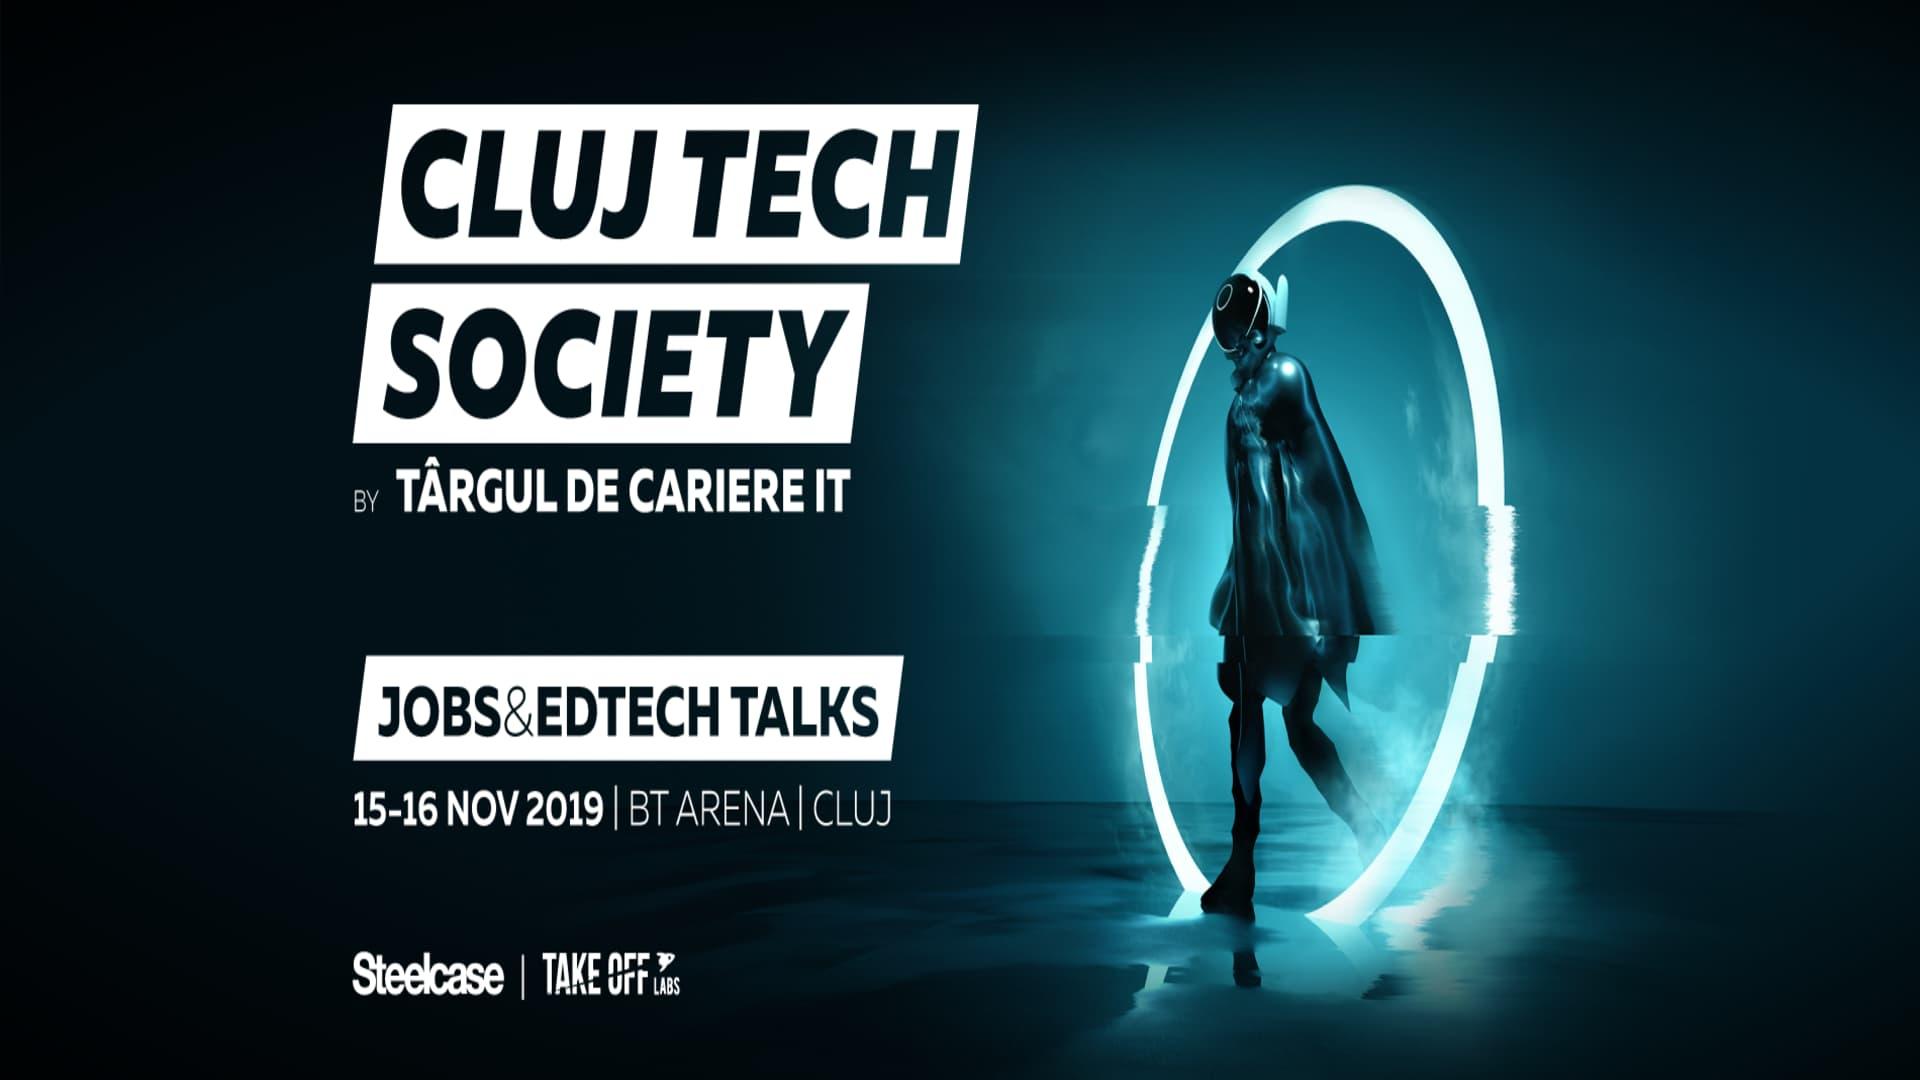 Vineri începe Cluj Tech Society la BT Arena